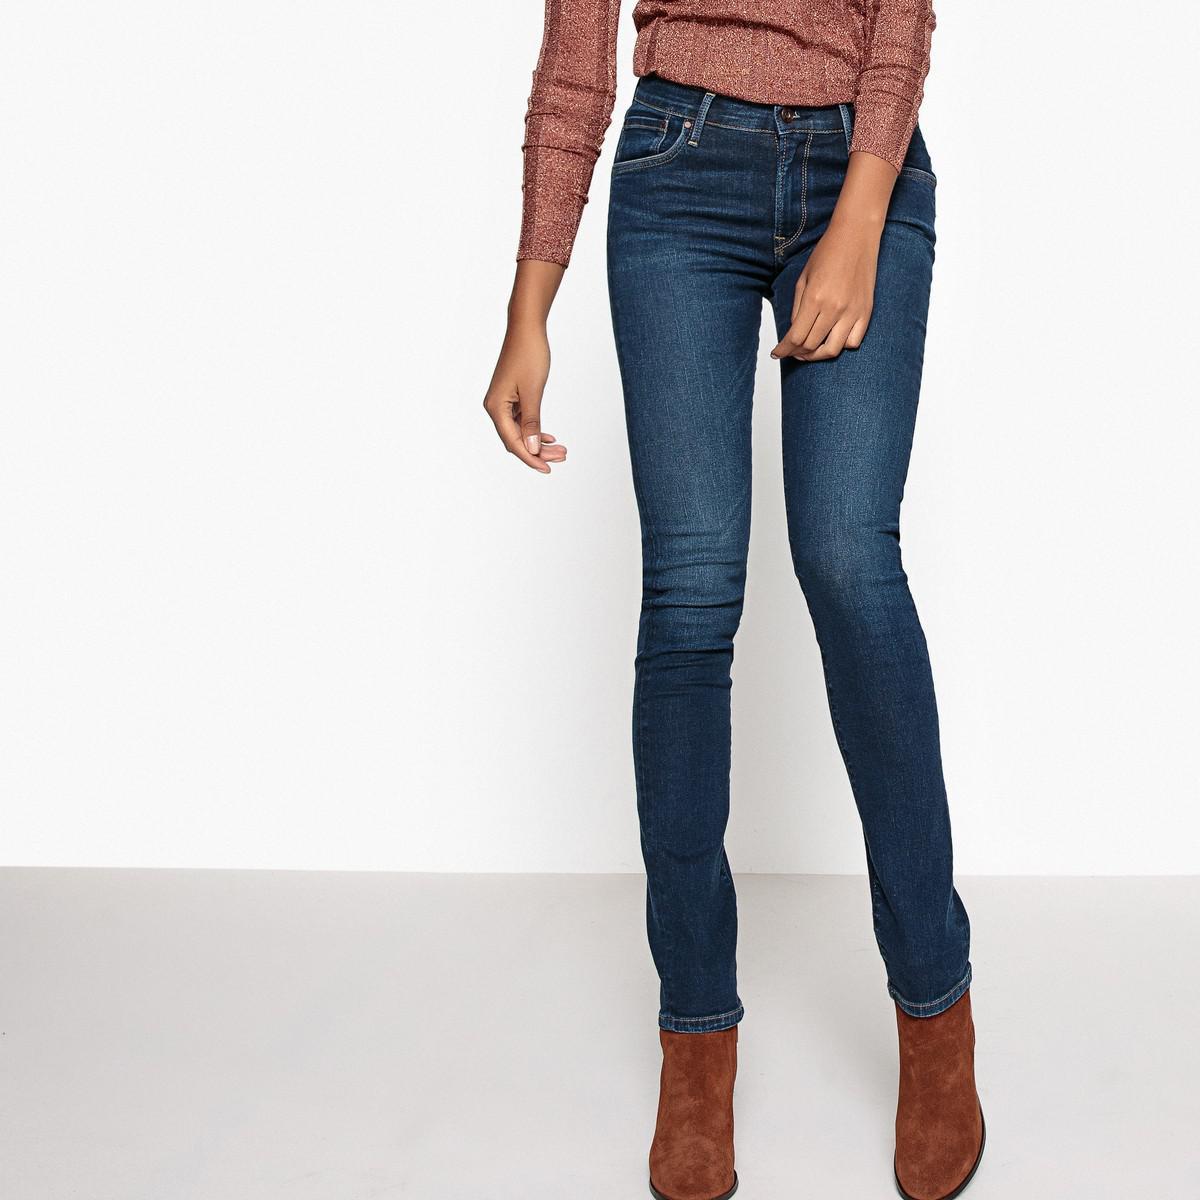 lyst pepe jeans victoria slim fit regular waist jeans in blue. Black Bedroom Furniture Sets. Home Design Ideas